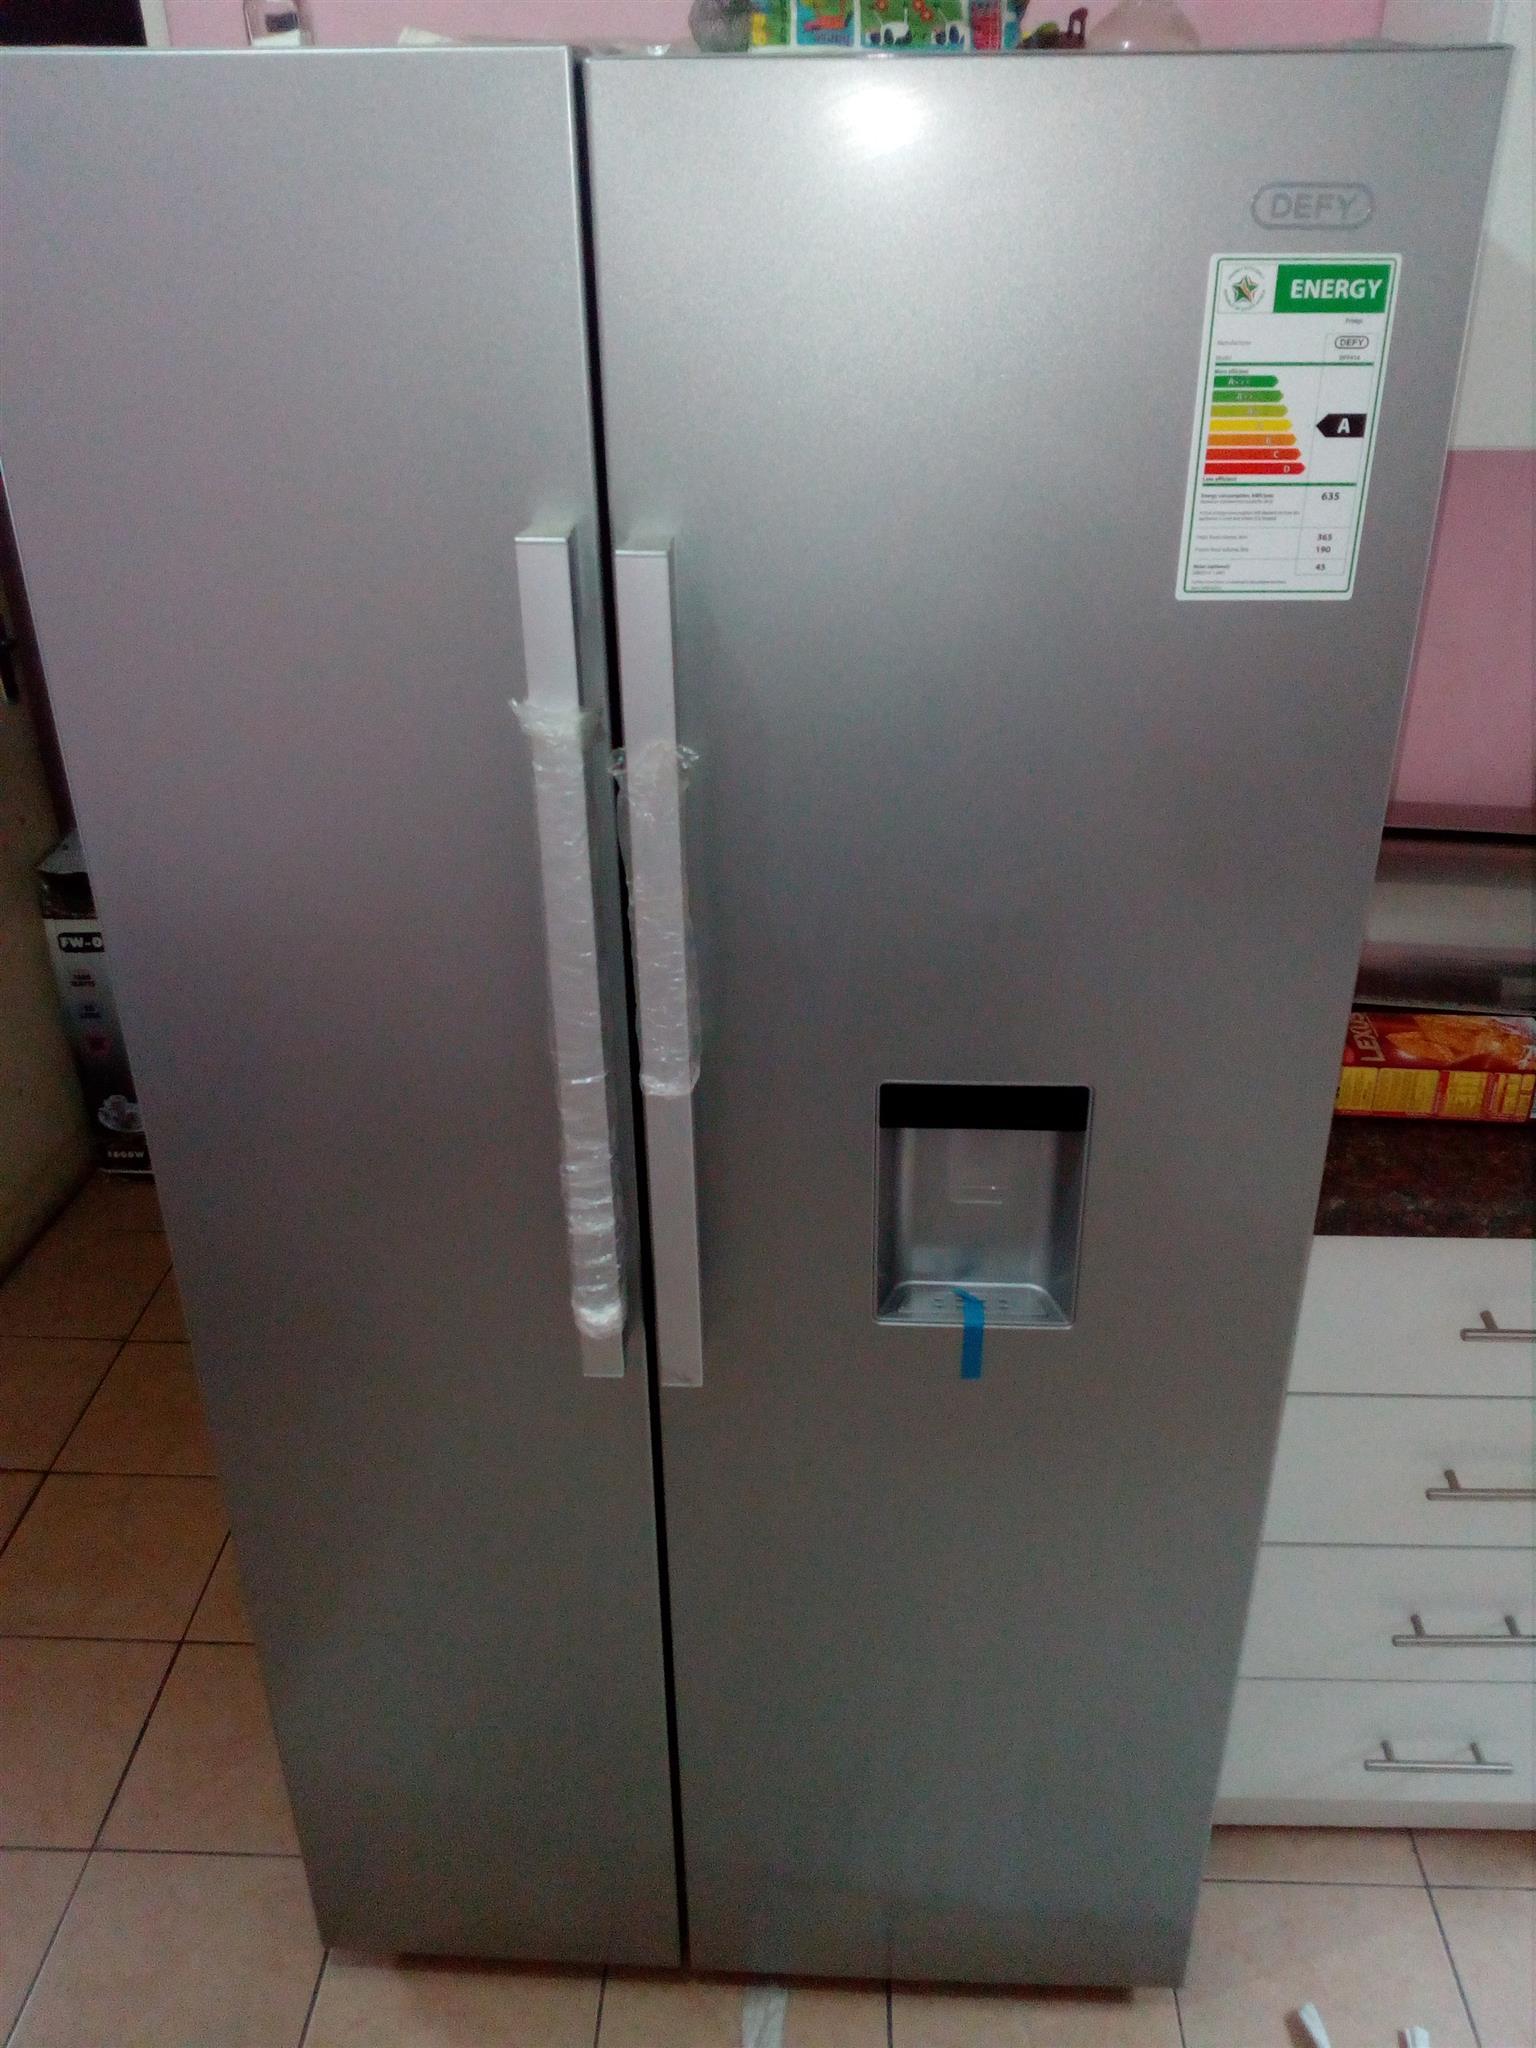 Defy Double Door Fridge   Side By Side Fridge And Freezer.